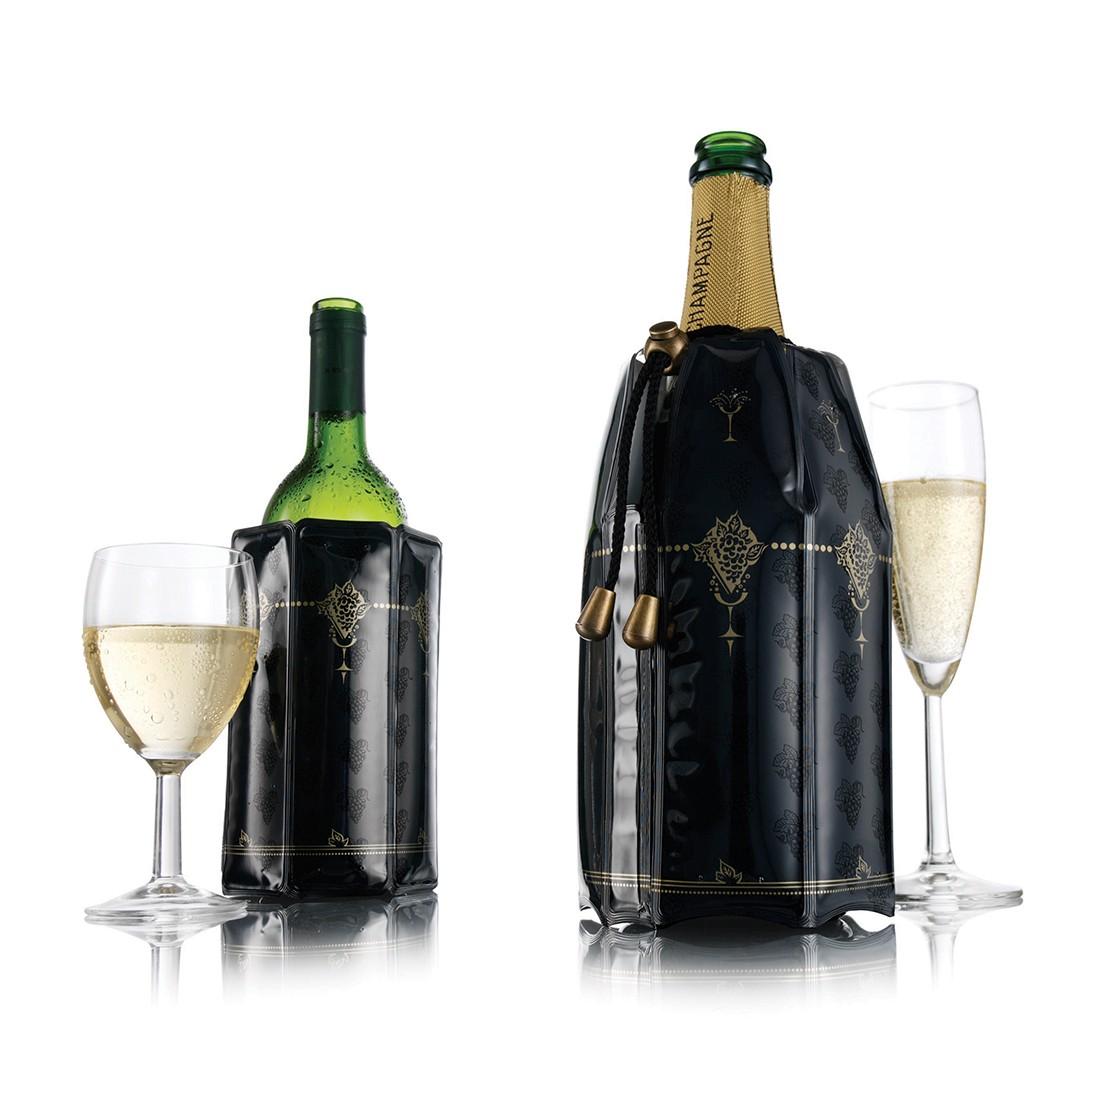 Wein & Champagner Kühler Klassik, Vacu Vin günstig bestellen